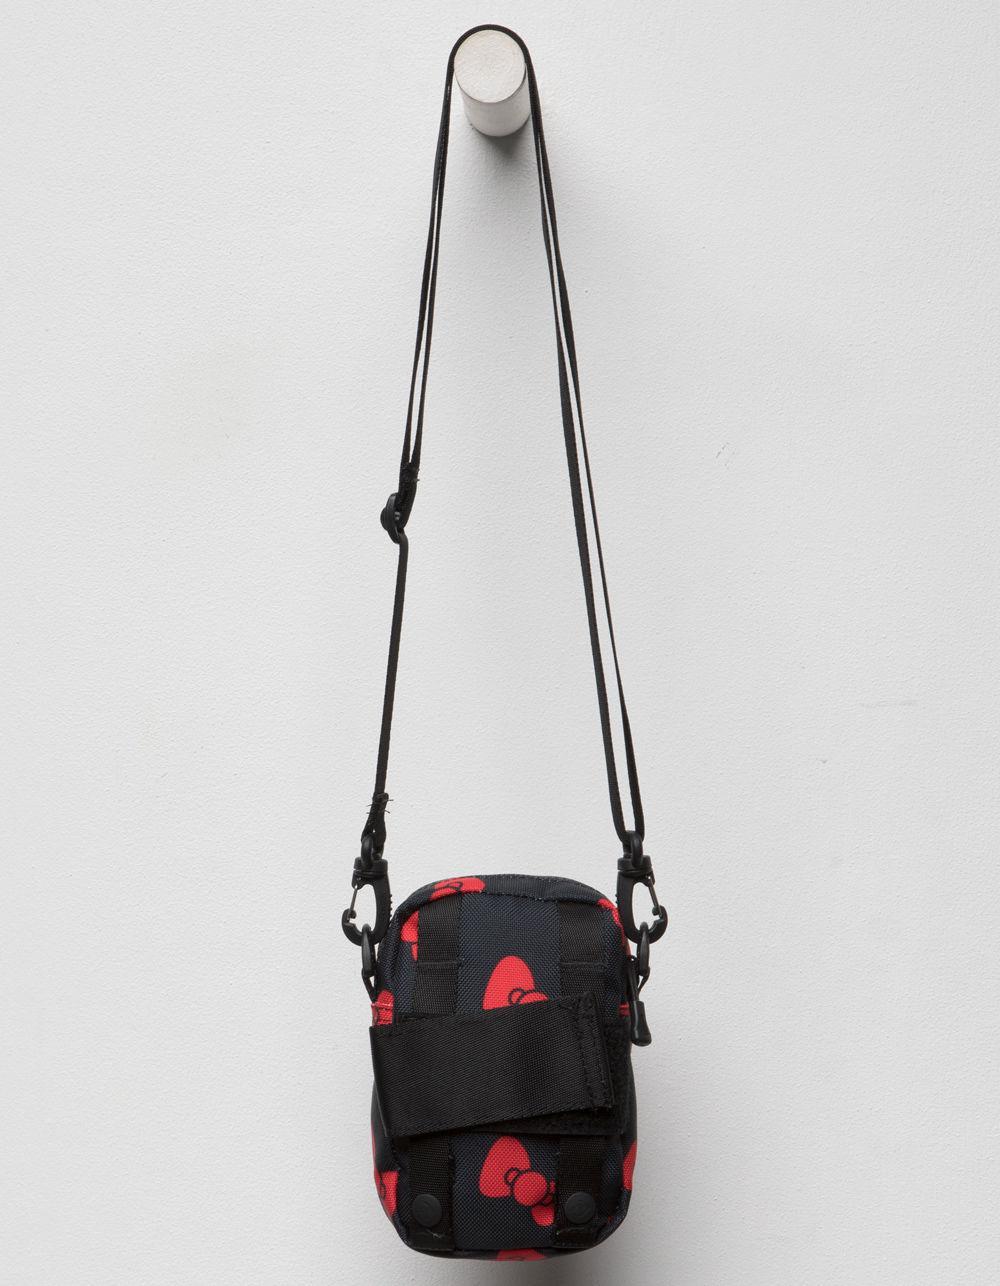 Lyst - Converse X Hello Kitty Black Mini Crossbody Bag in Black 52b7b8a23f1e6